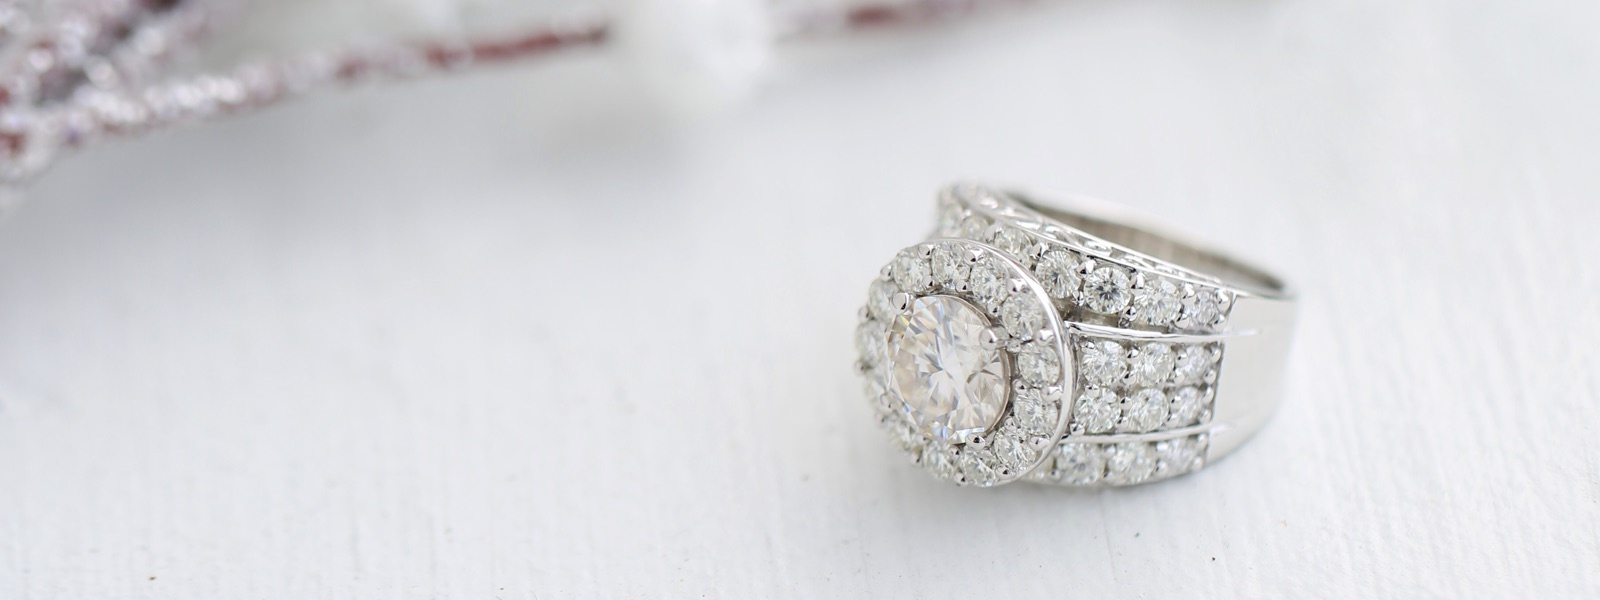 Jtv Jewelry Diamonds Gemstones Rings Necklaces Earrings Jtv Com